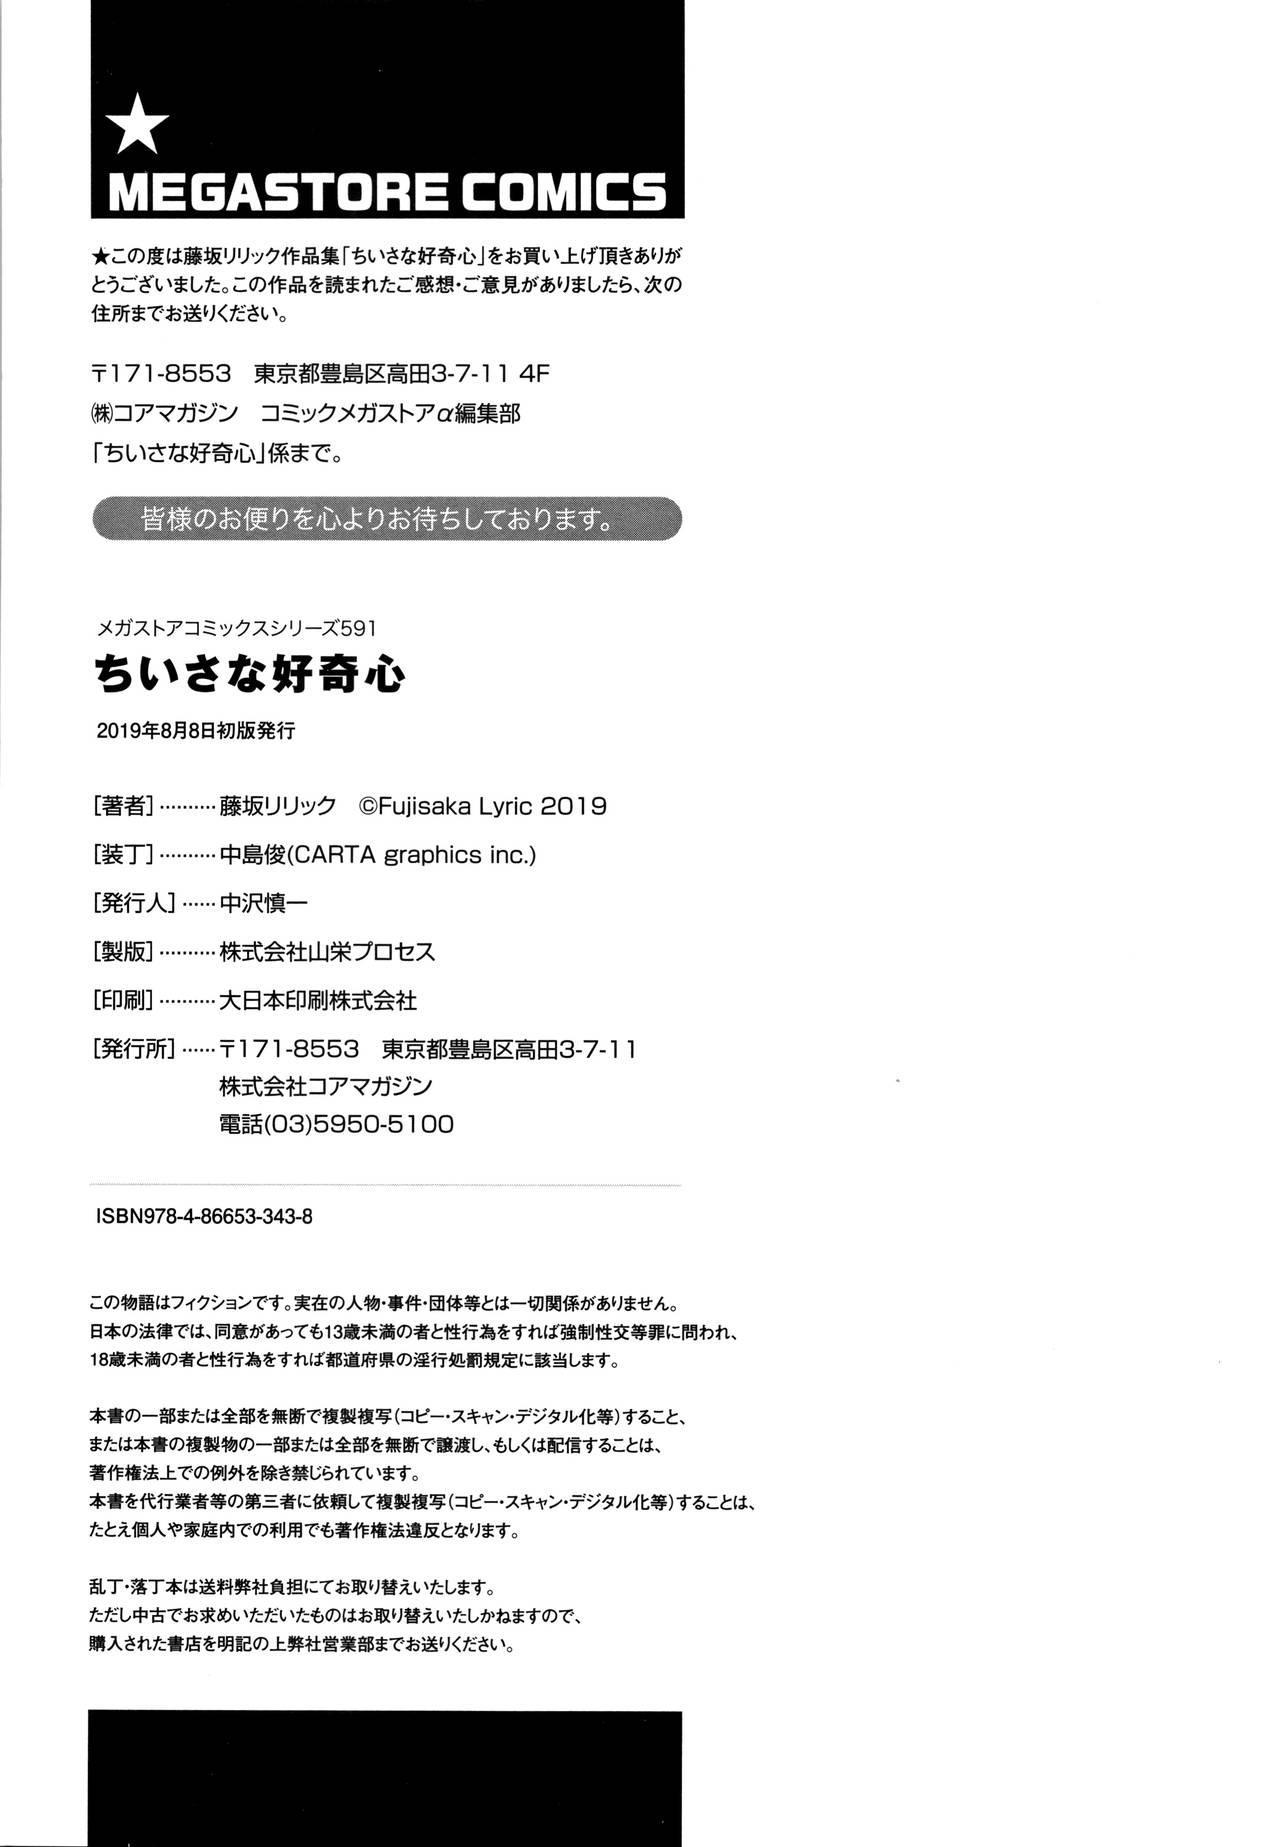 Chiisana Koukishin 196